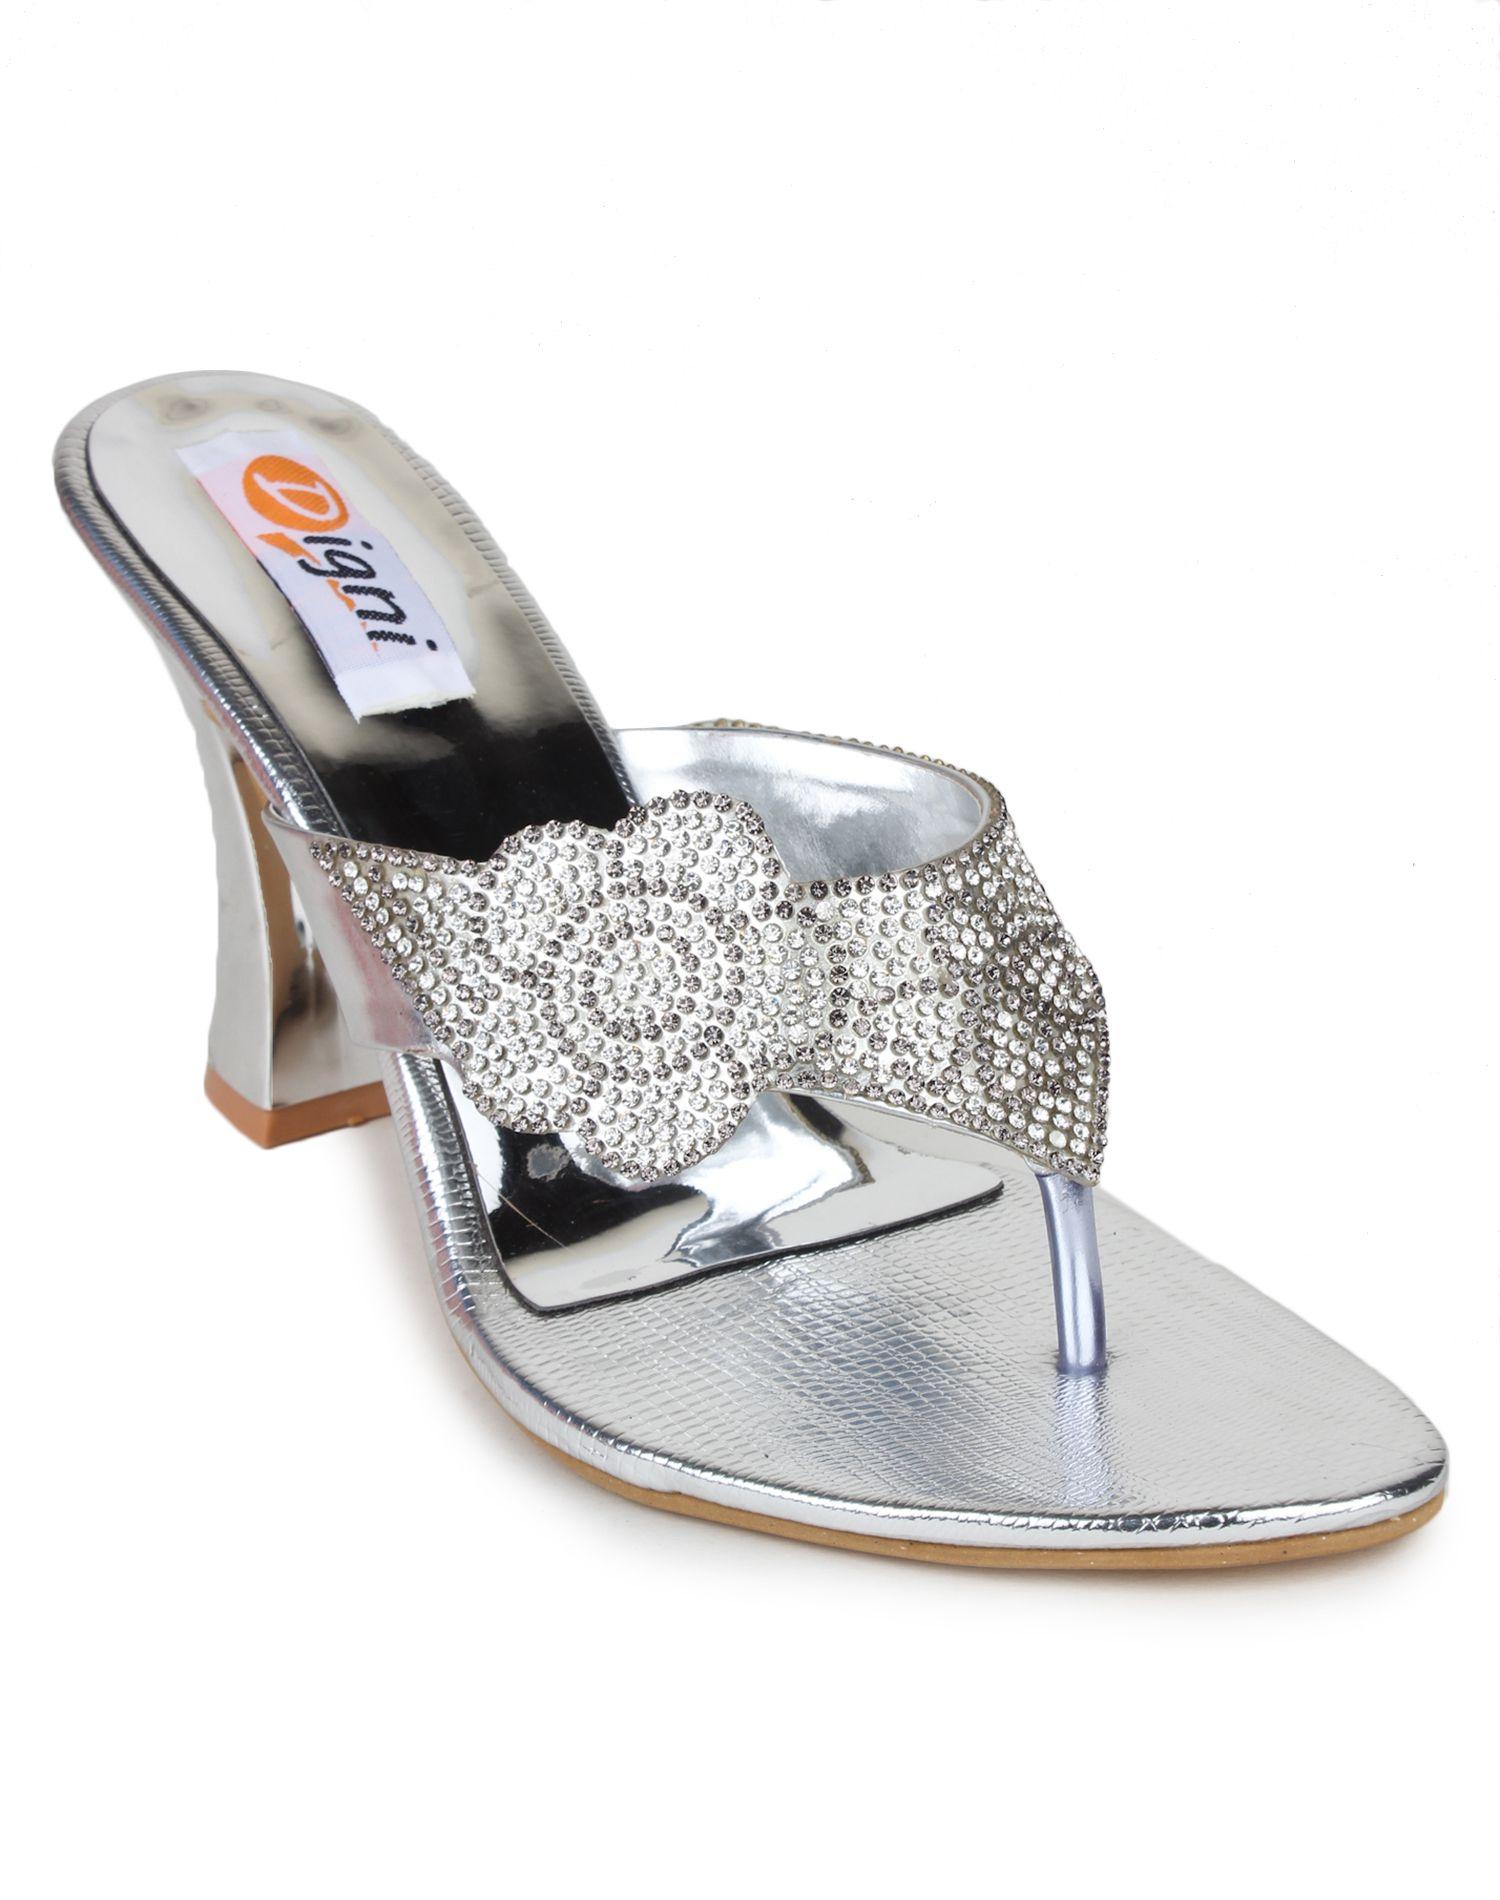 DIGNI Silver Block Heels